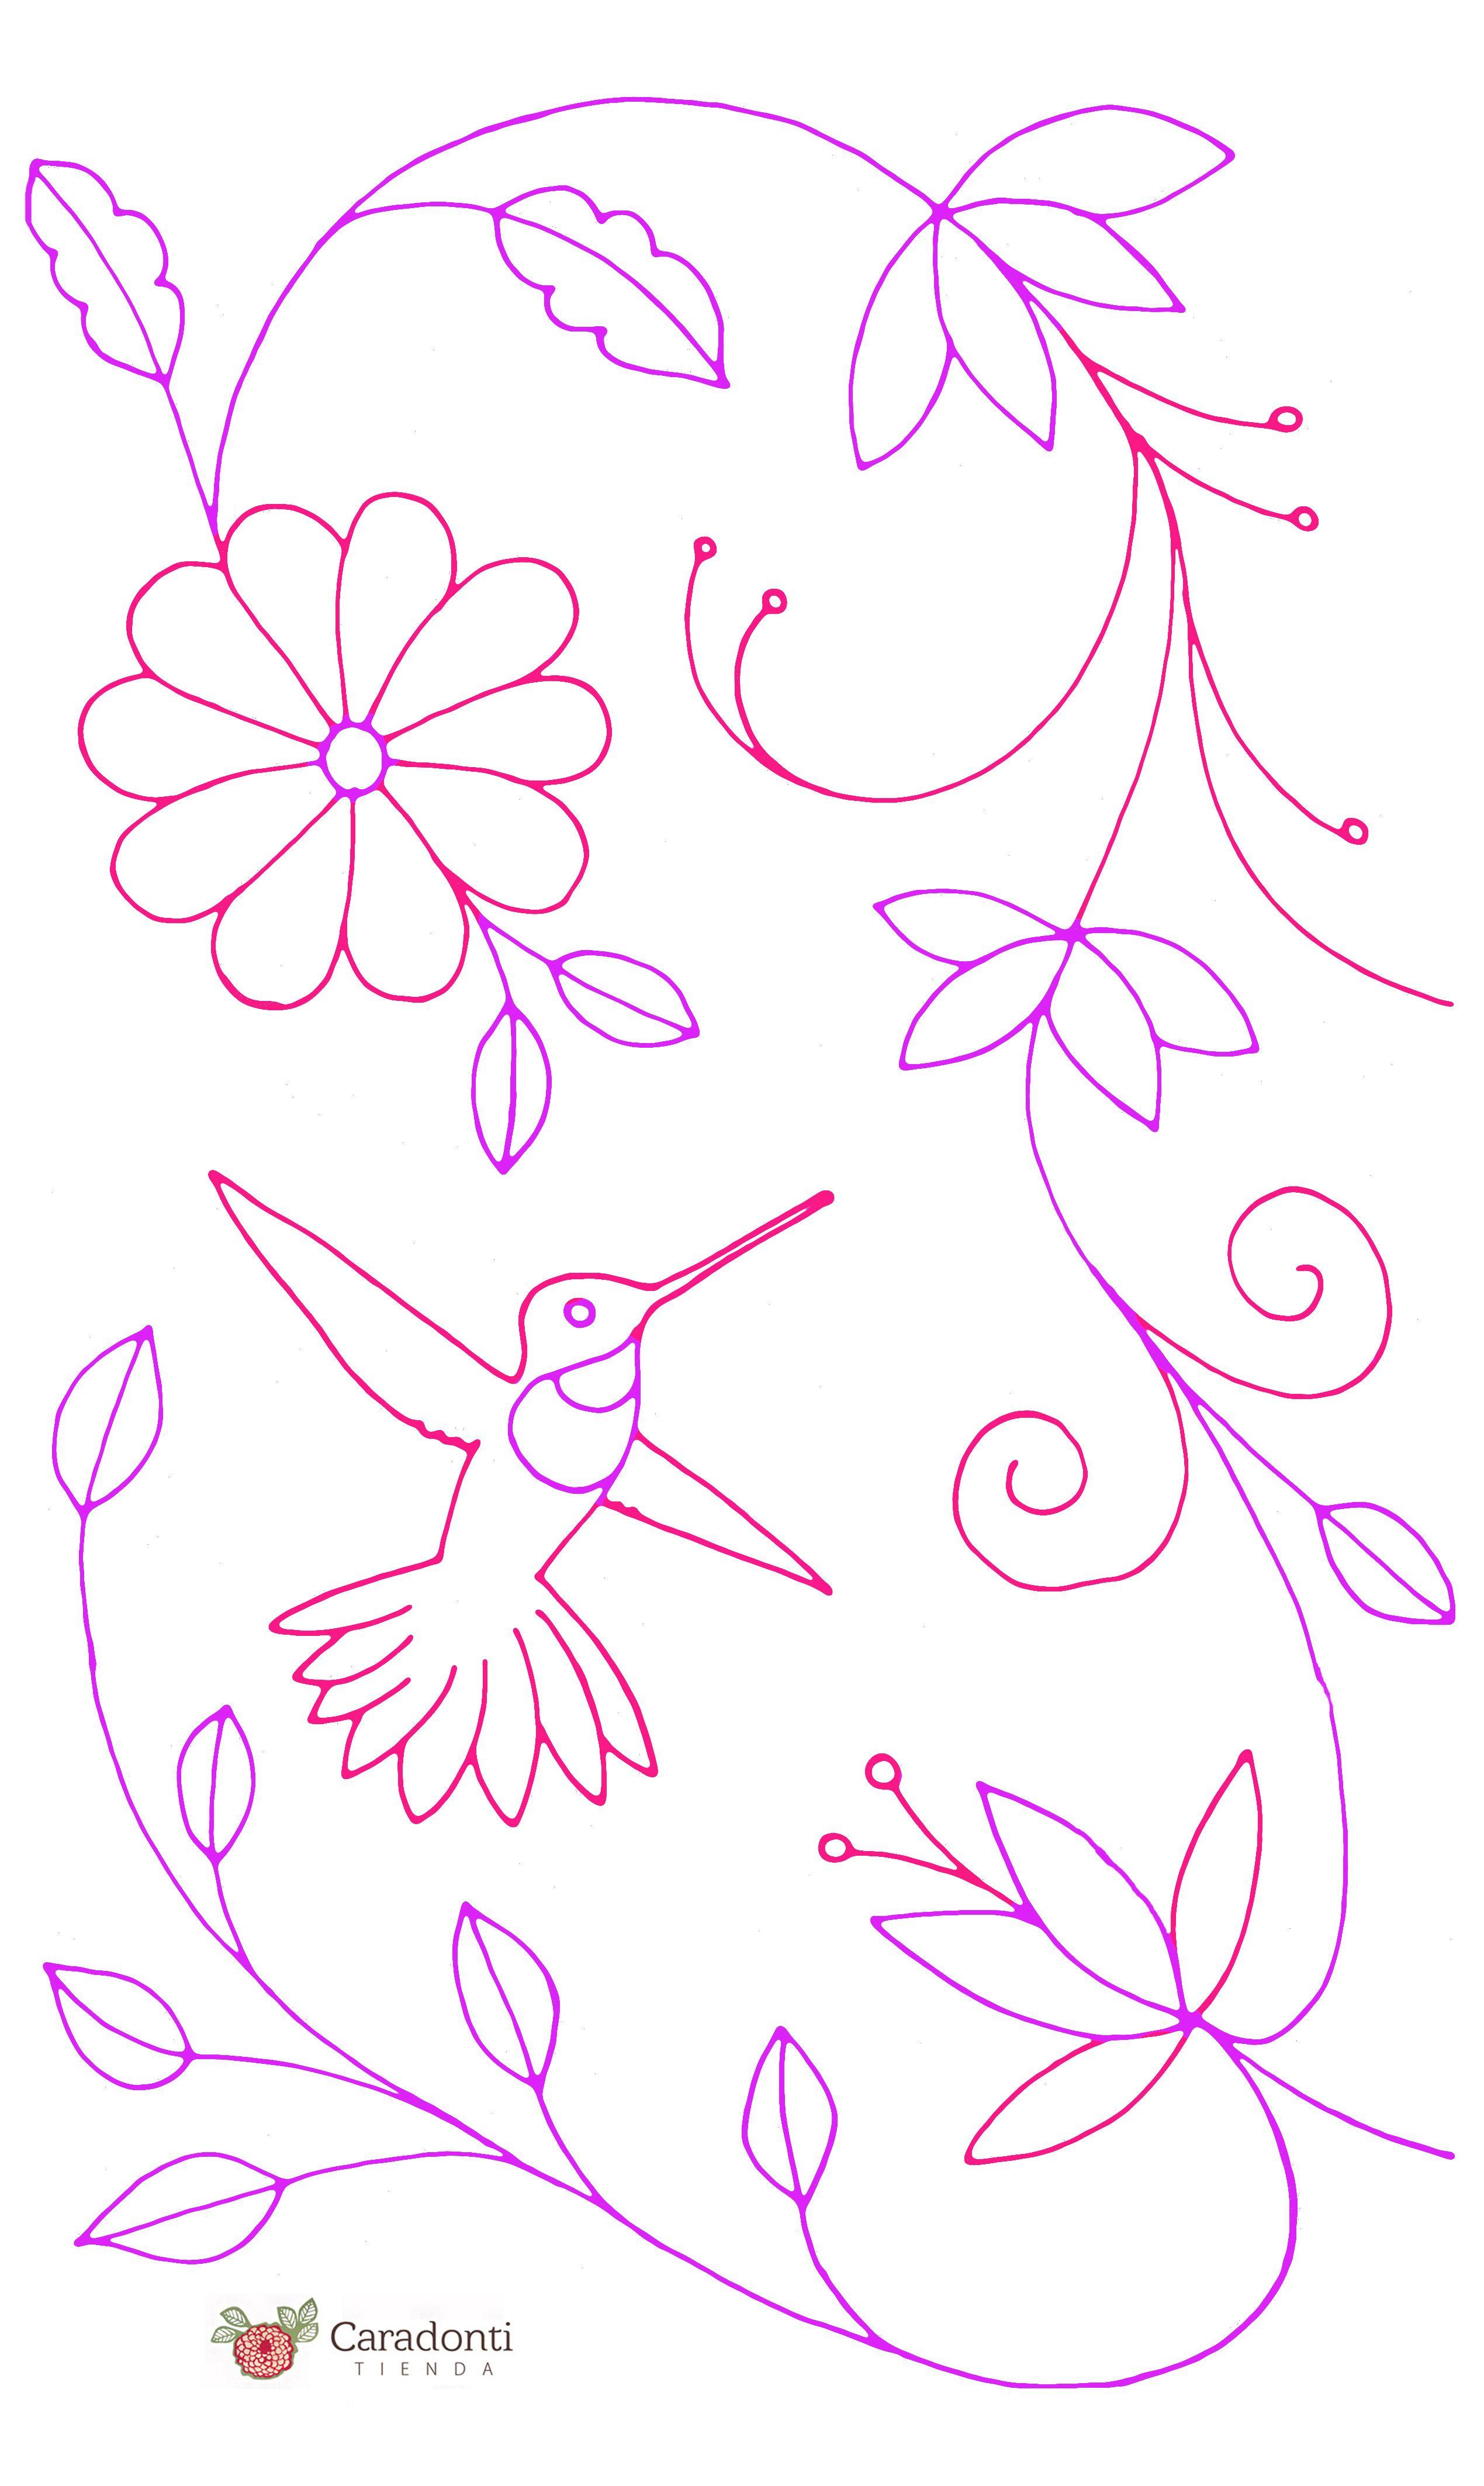 Pin de Lucia López Posada en Cross it! | Pinterest | Embroidery ...